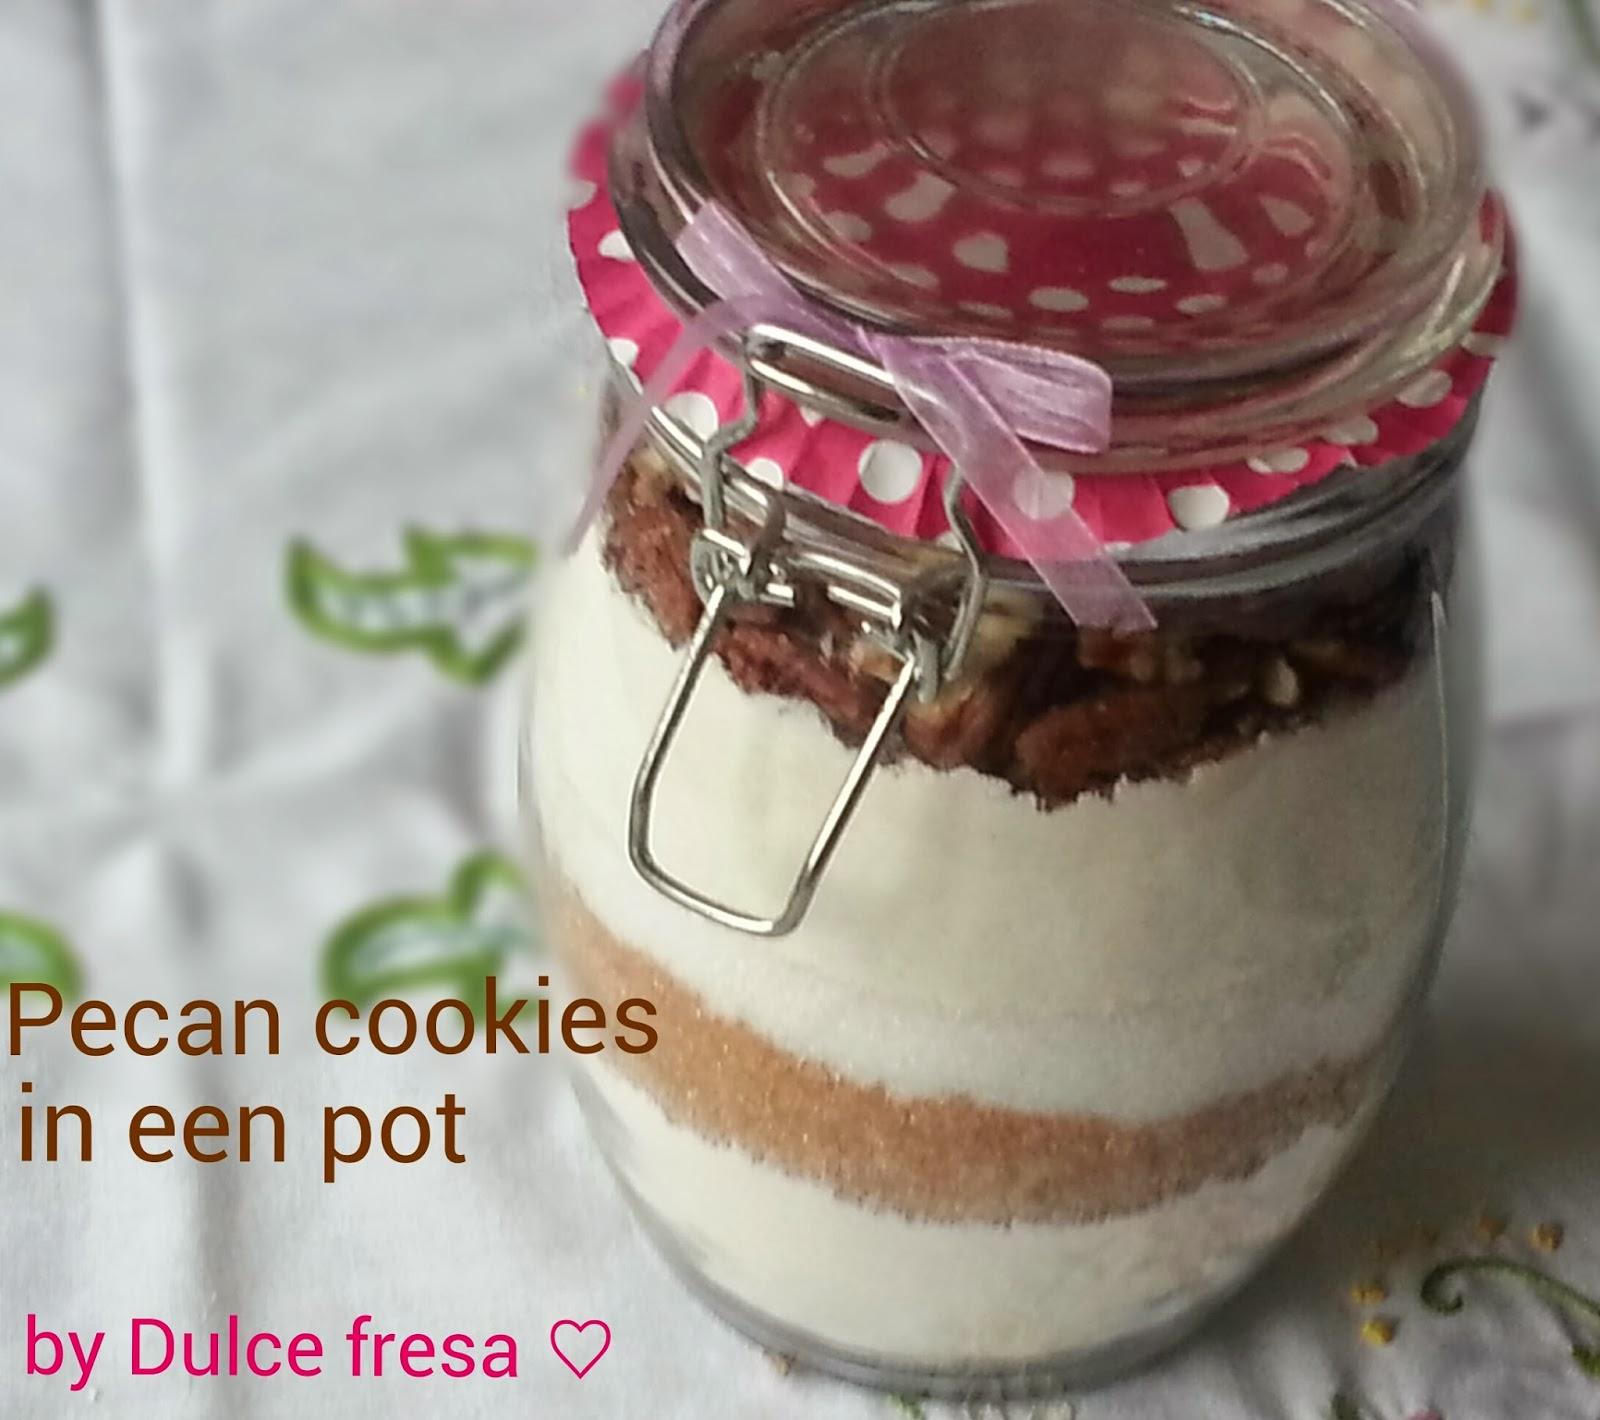 Vaak Dulce fresa is Verhuisd! dulcefresa.nl : 2013 @UQ06